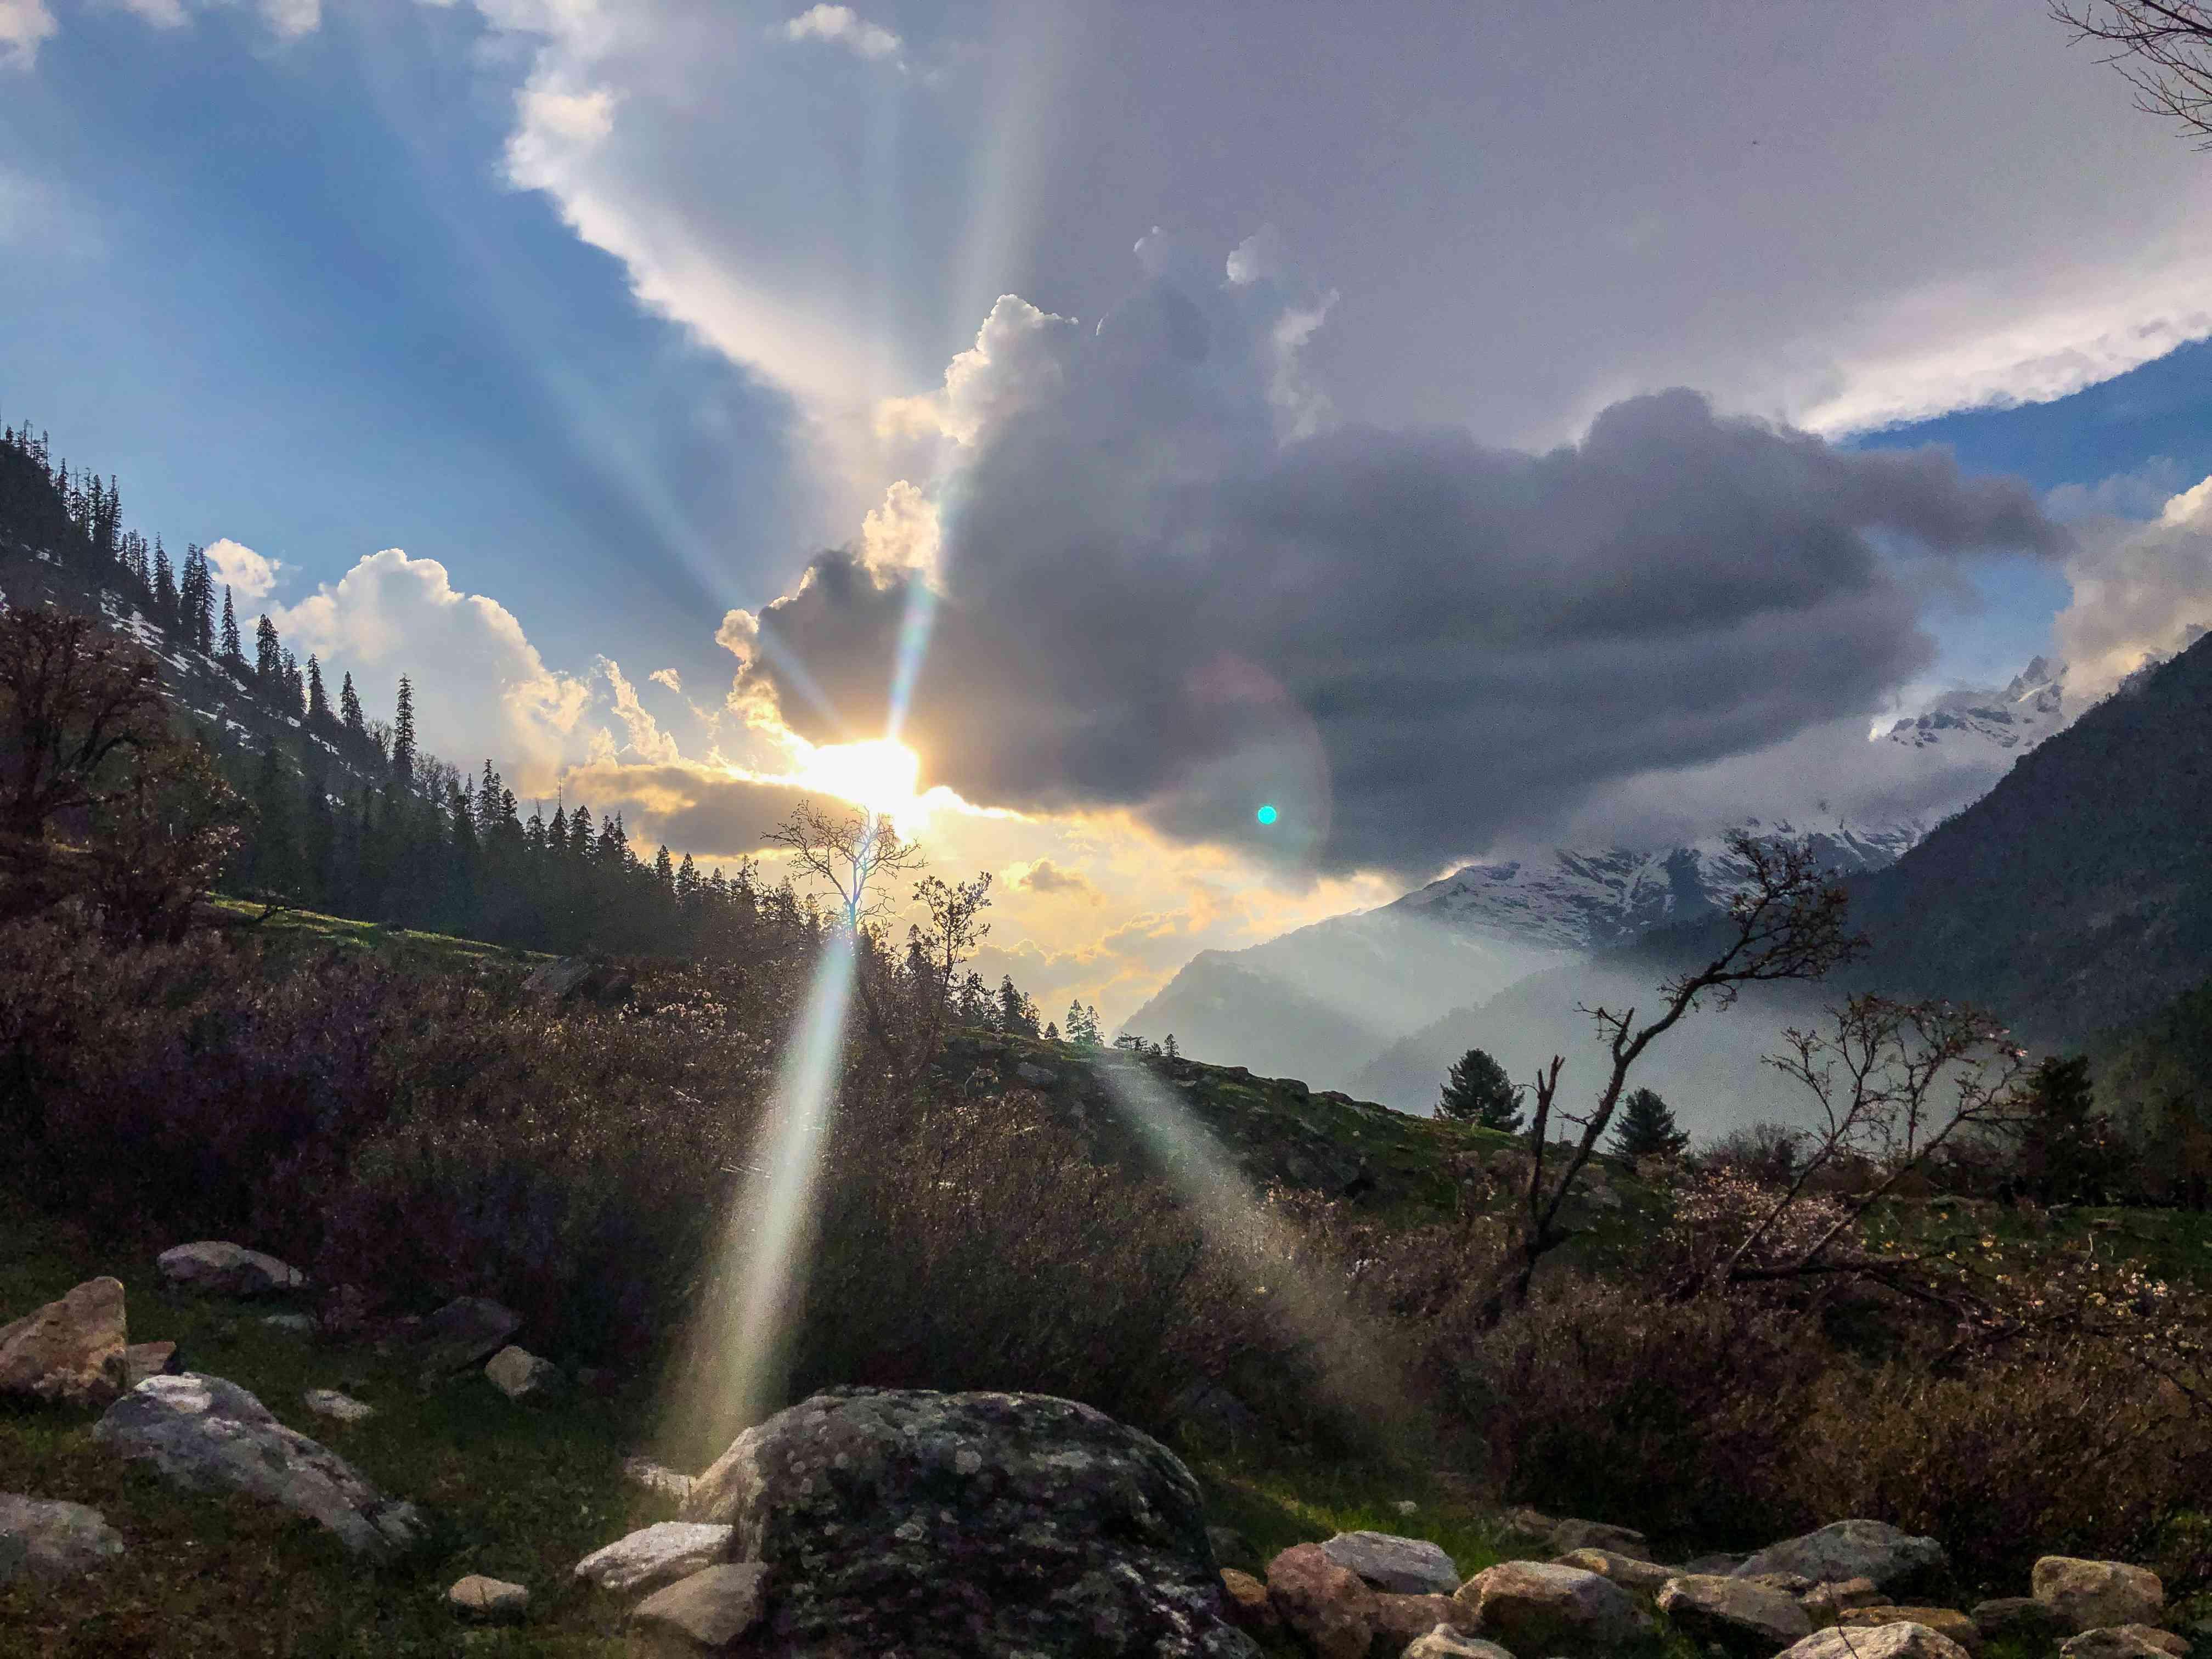 Beautiful sunrise view kheerganga mountains Uttarakhand india